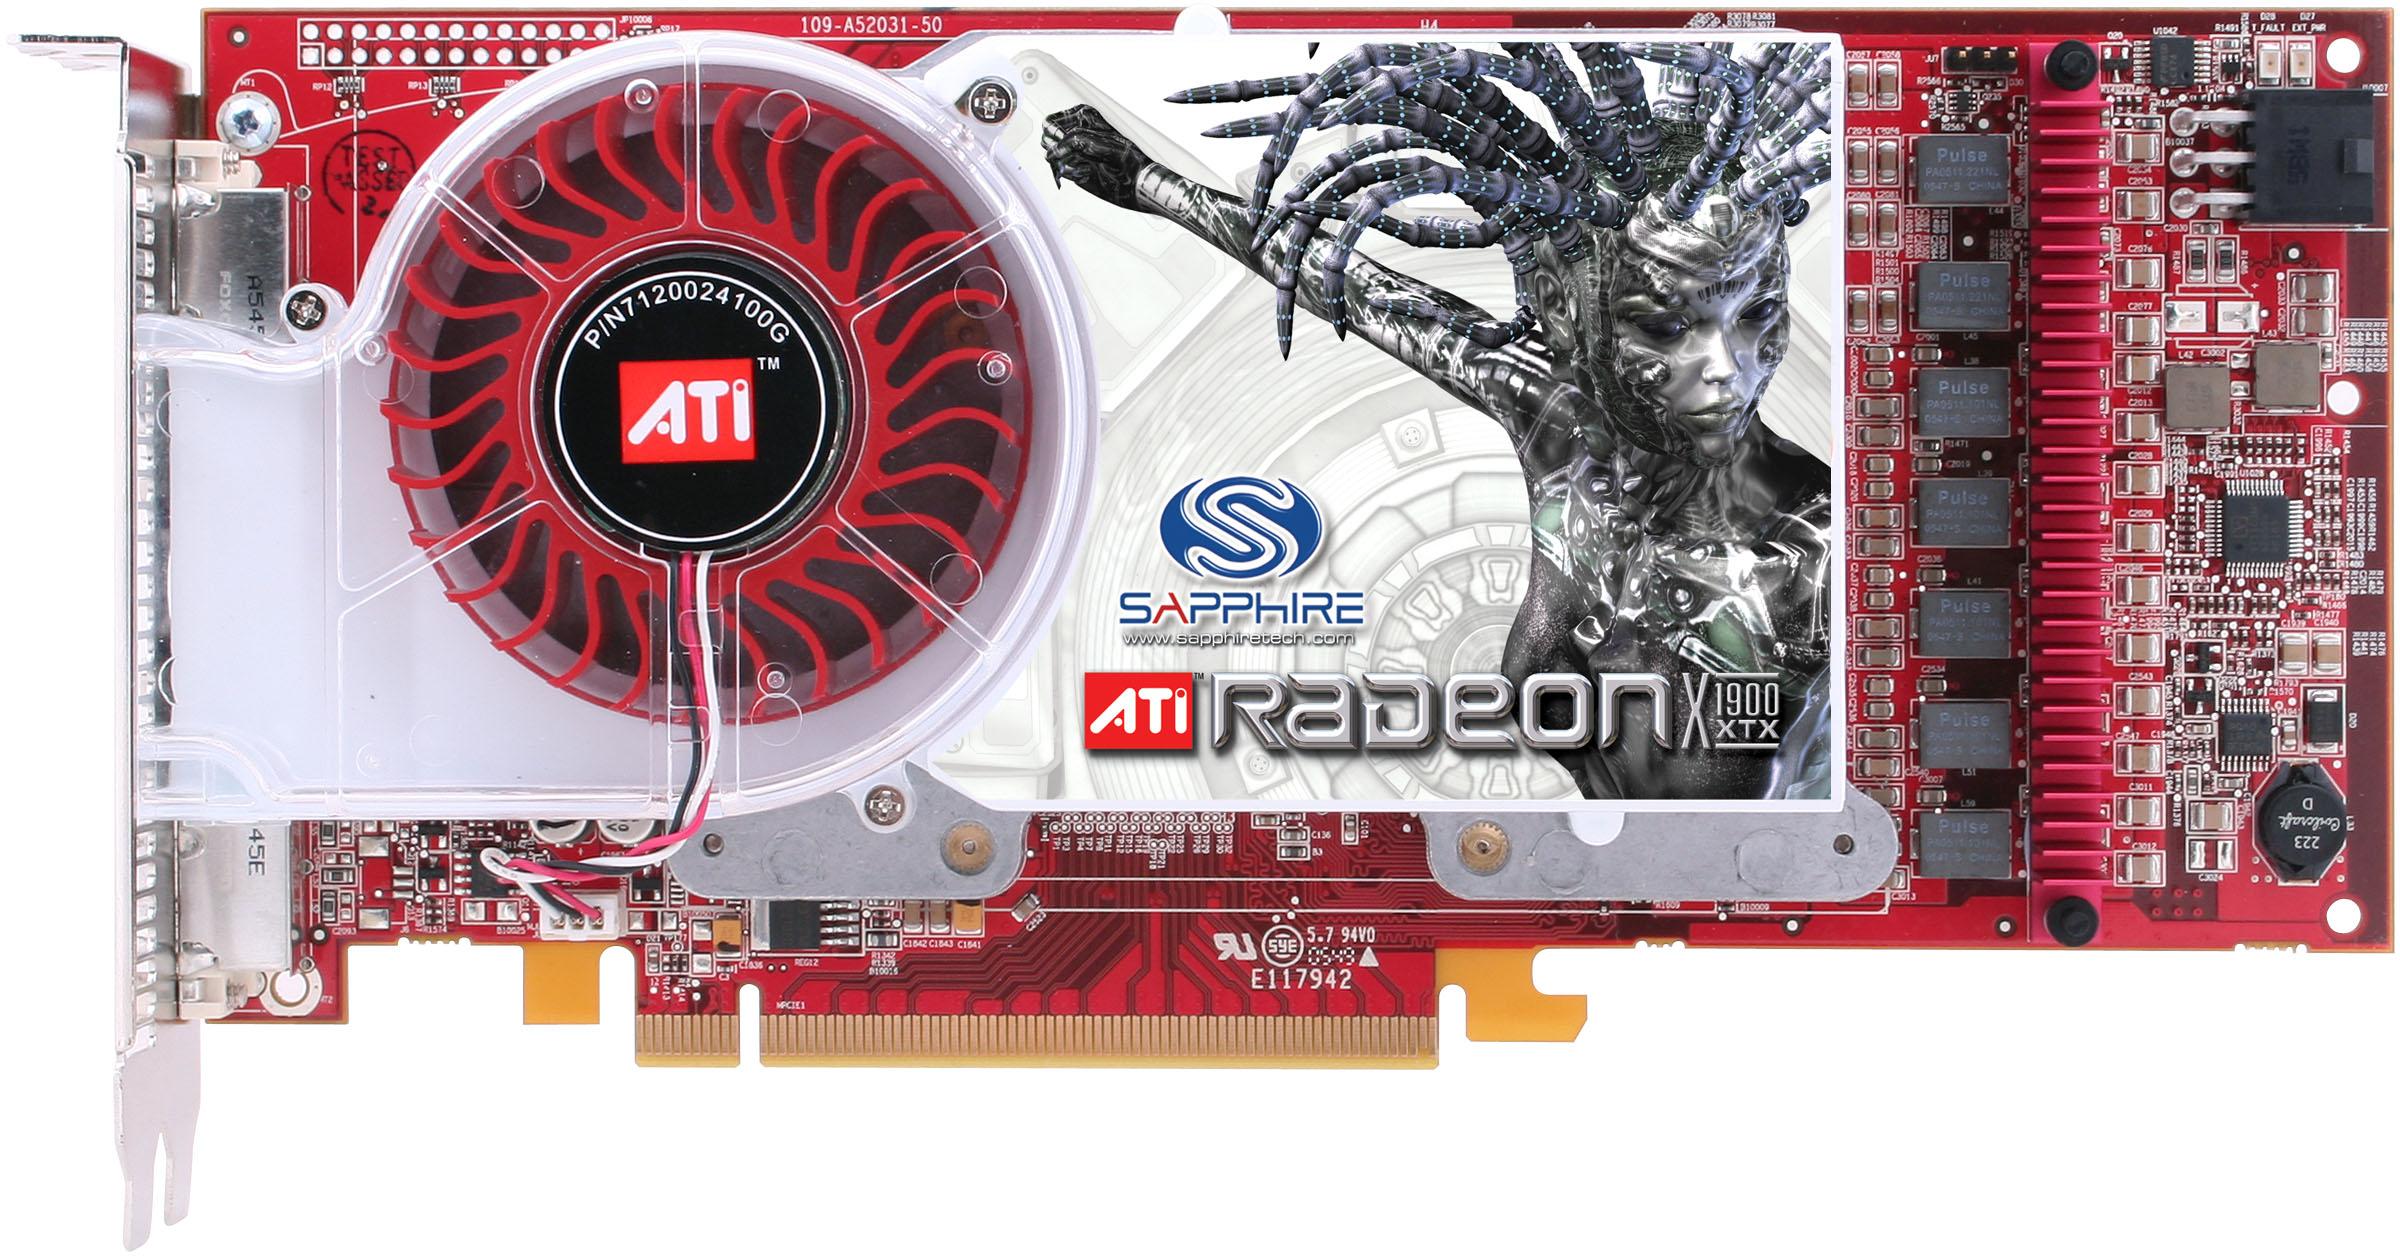 ATI Mobility Radeon HD 5470 Driver Update Windows Black Screen